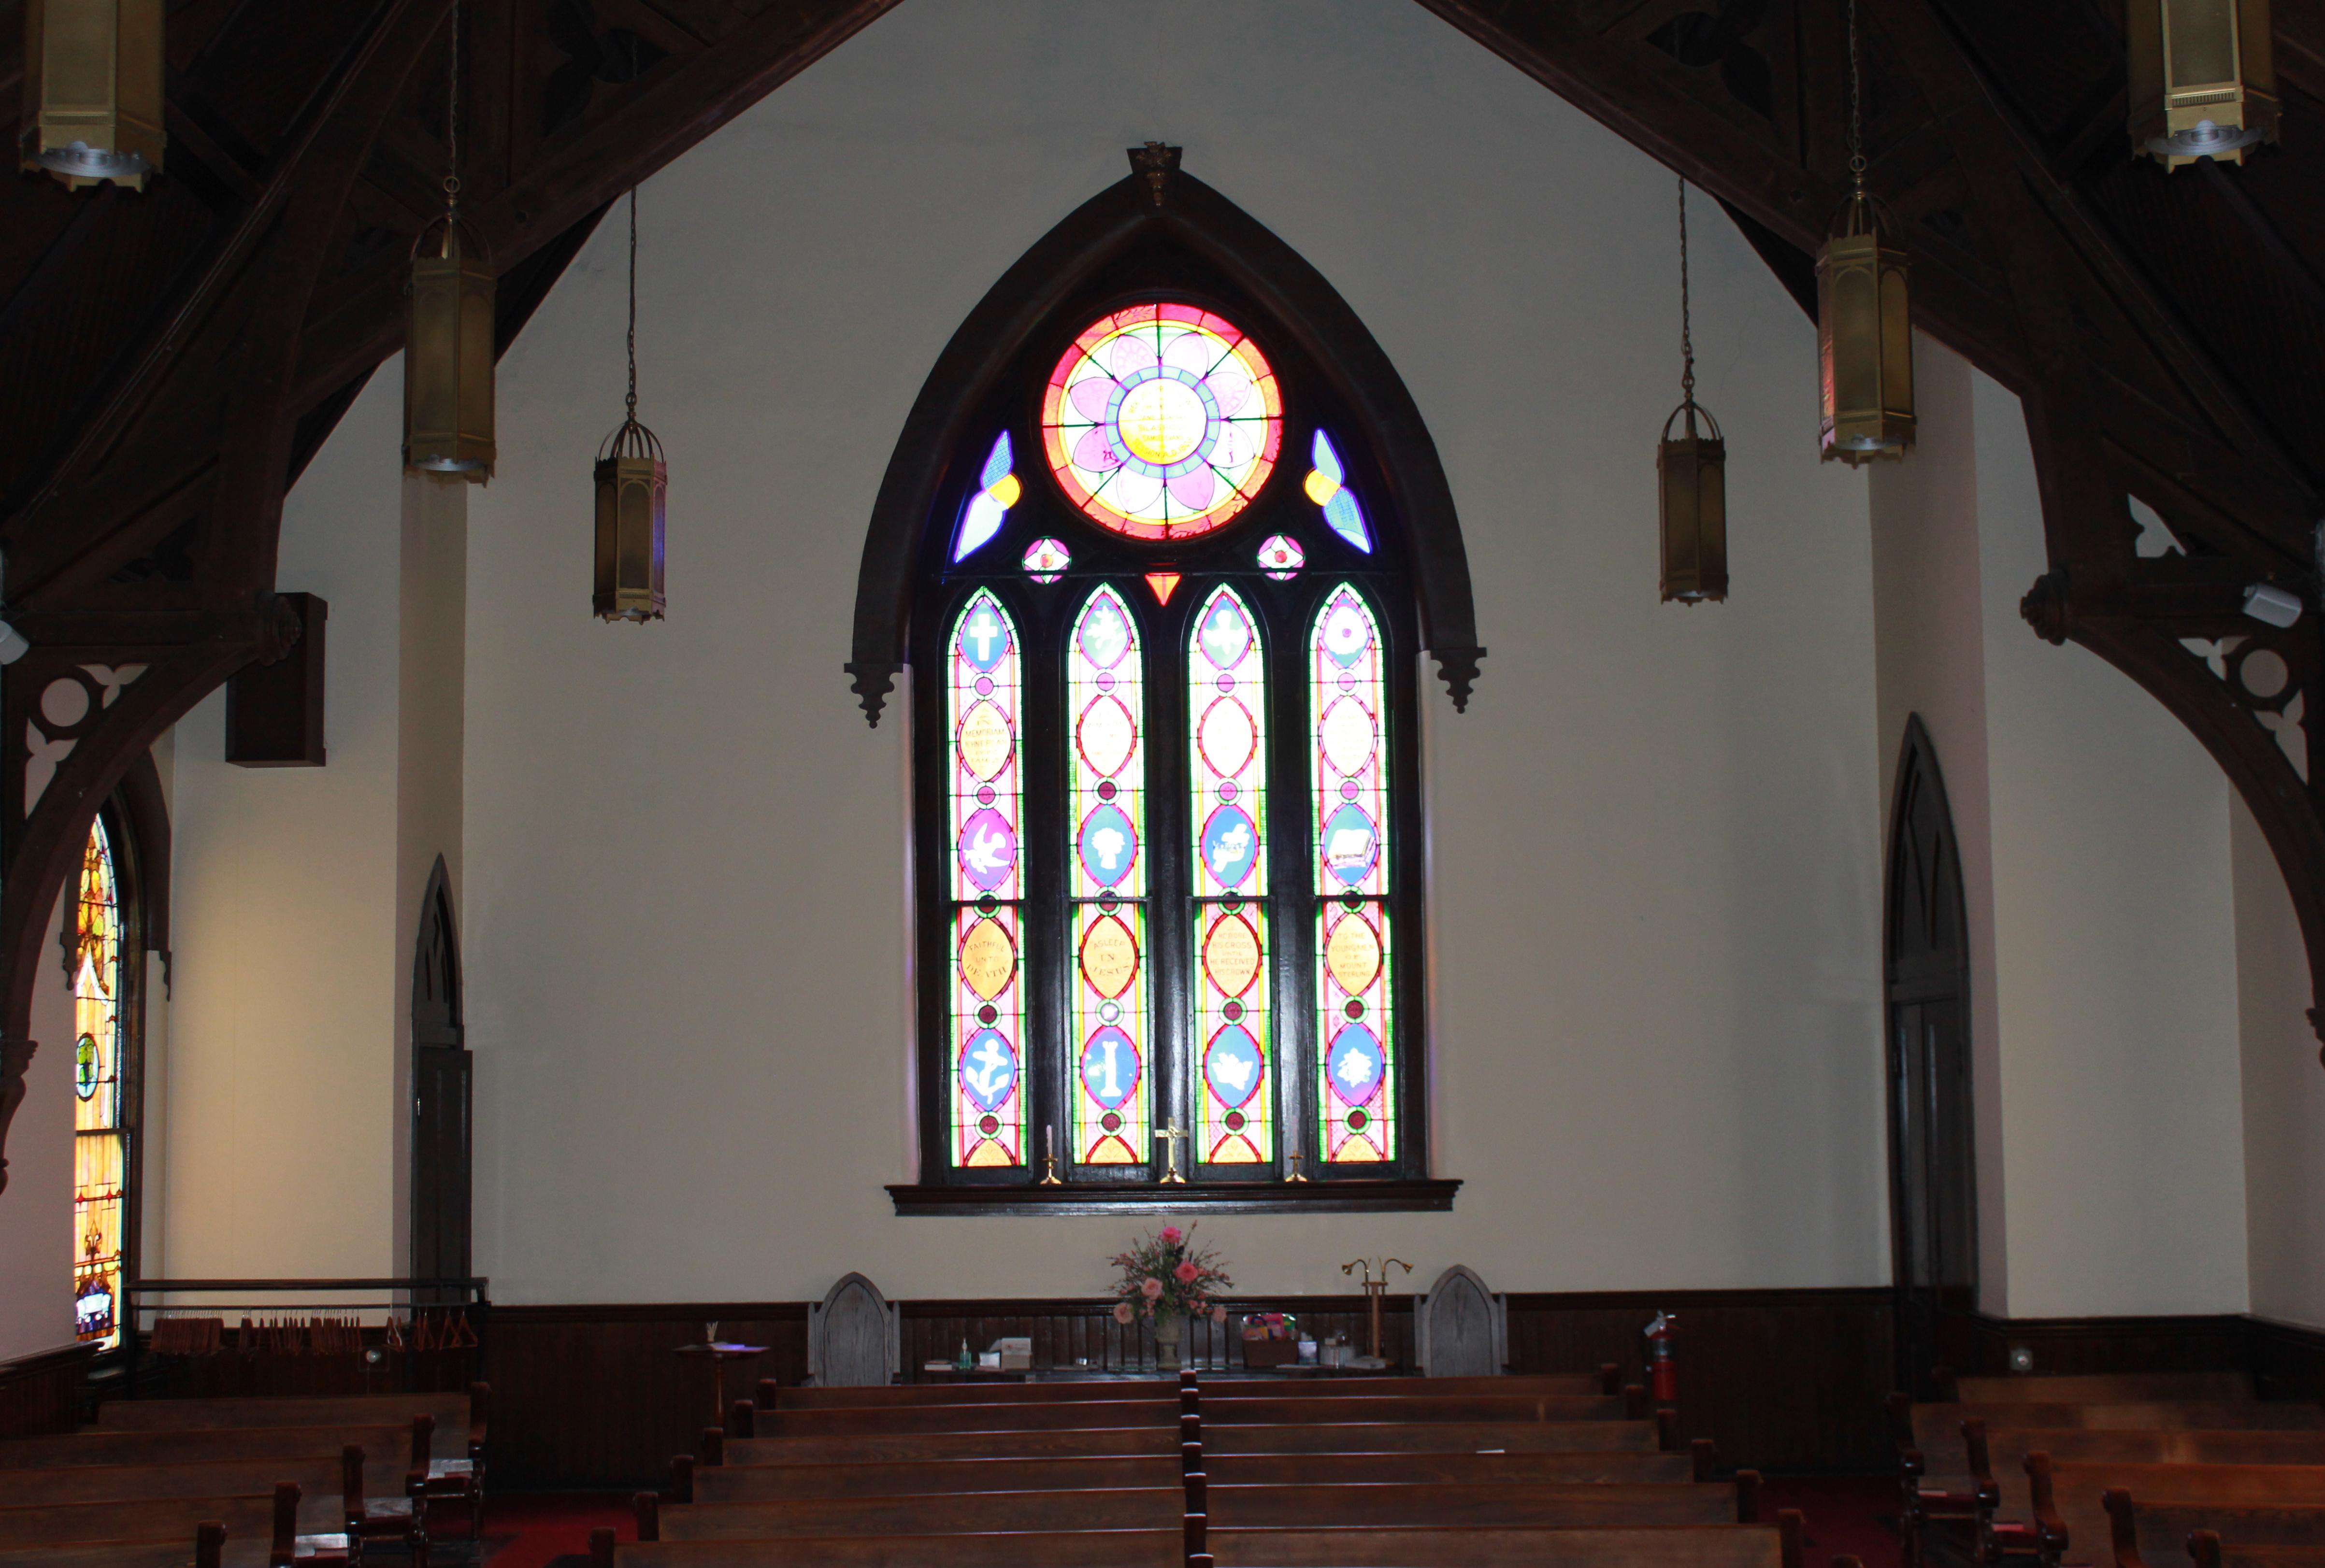 Back of church window